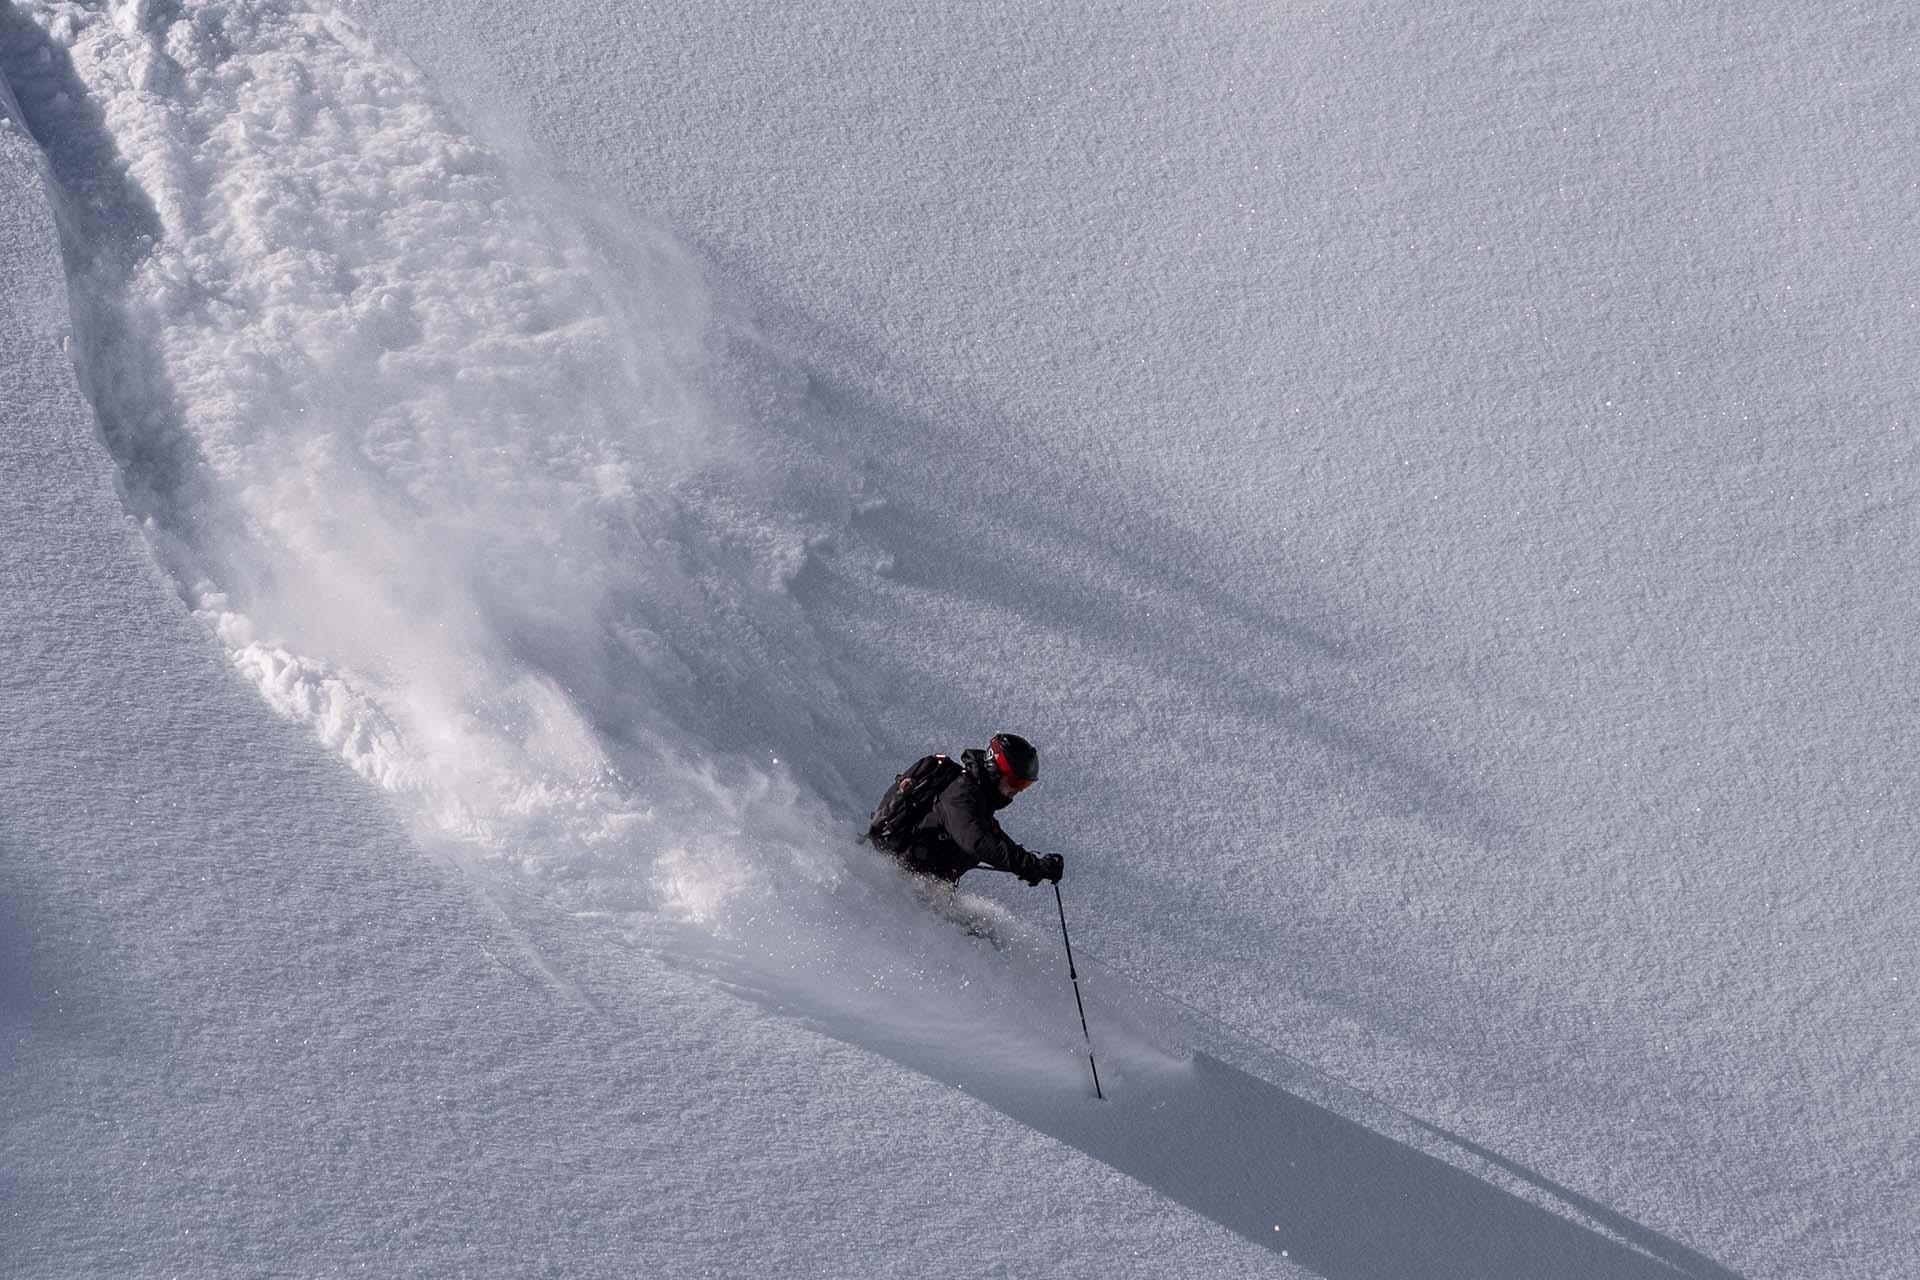 Jackson Hole Heli Ski